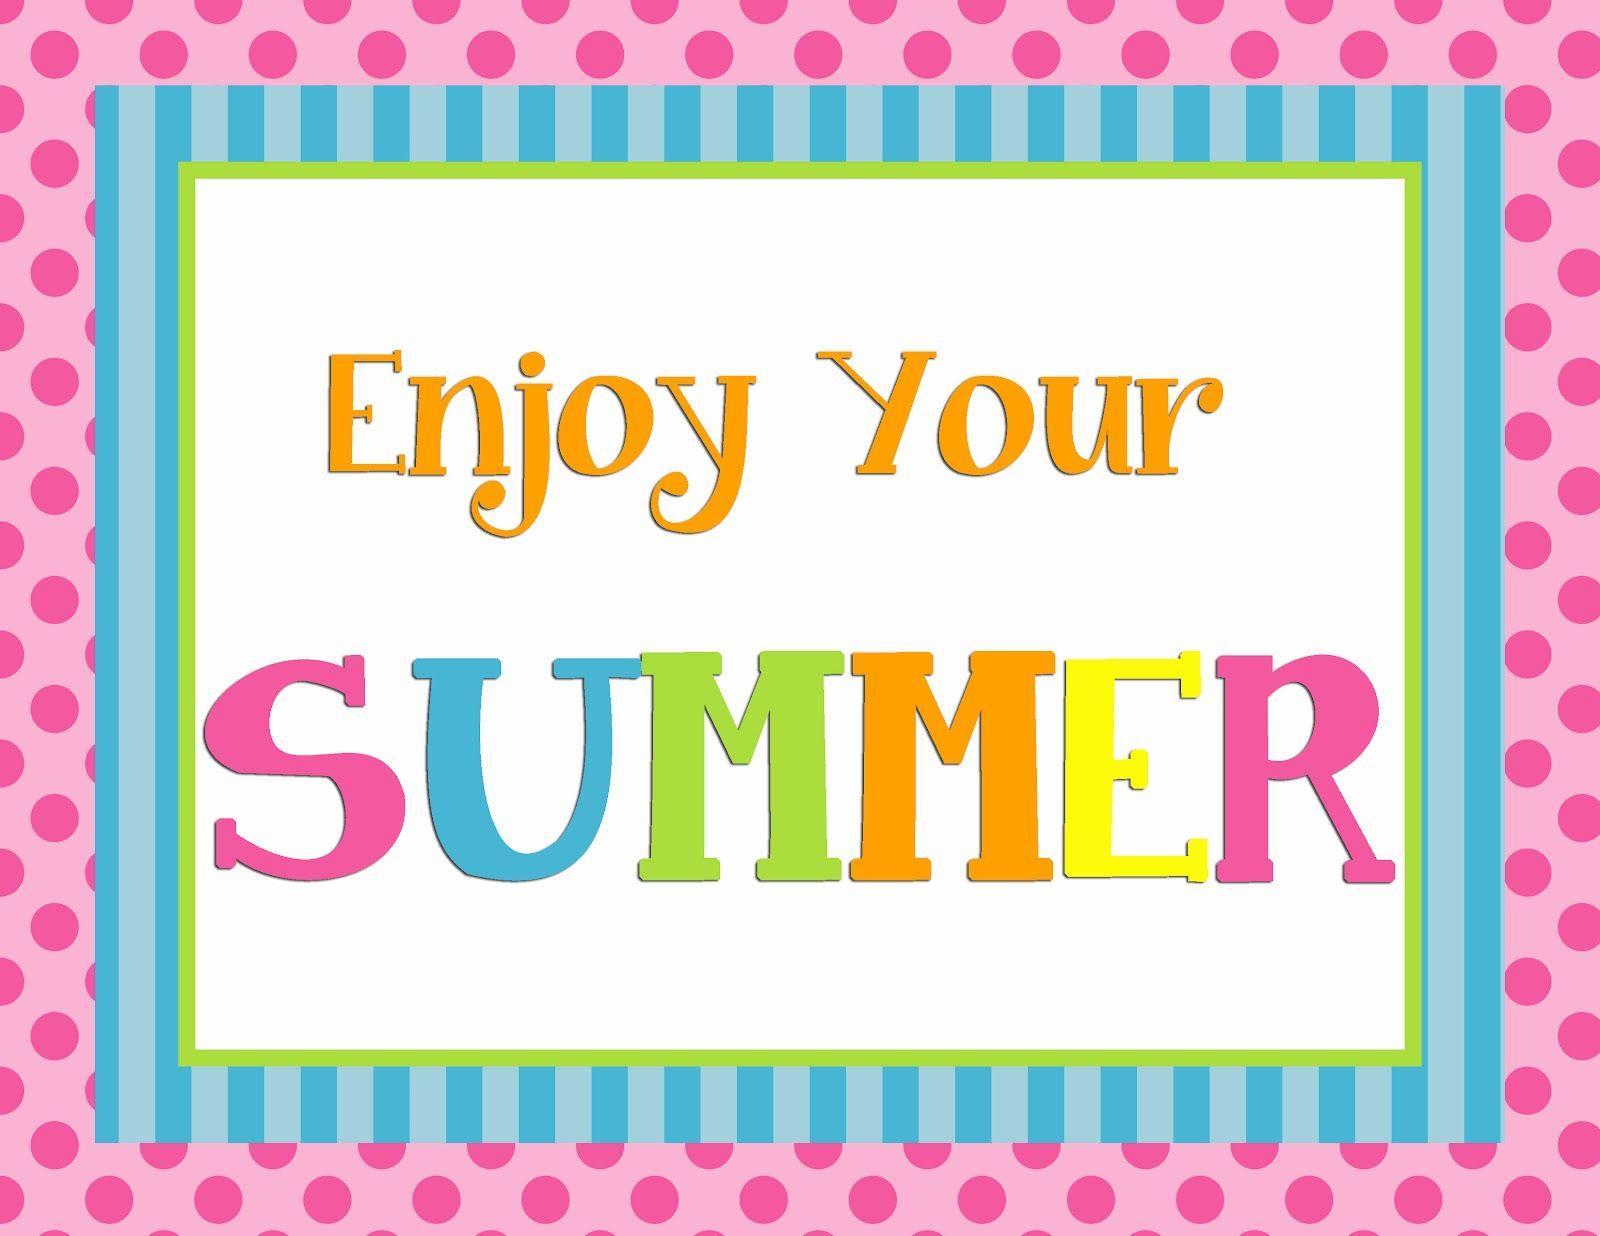 Free Printable summer sign | FREE Printables | Pinterest | Summer ...